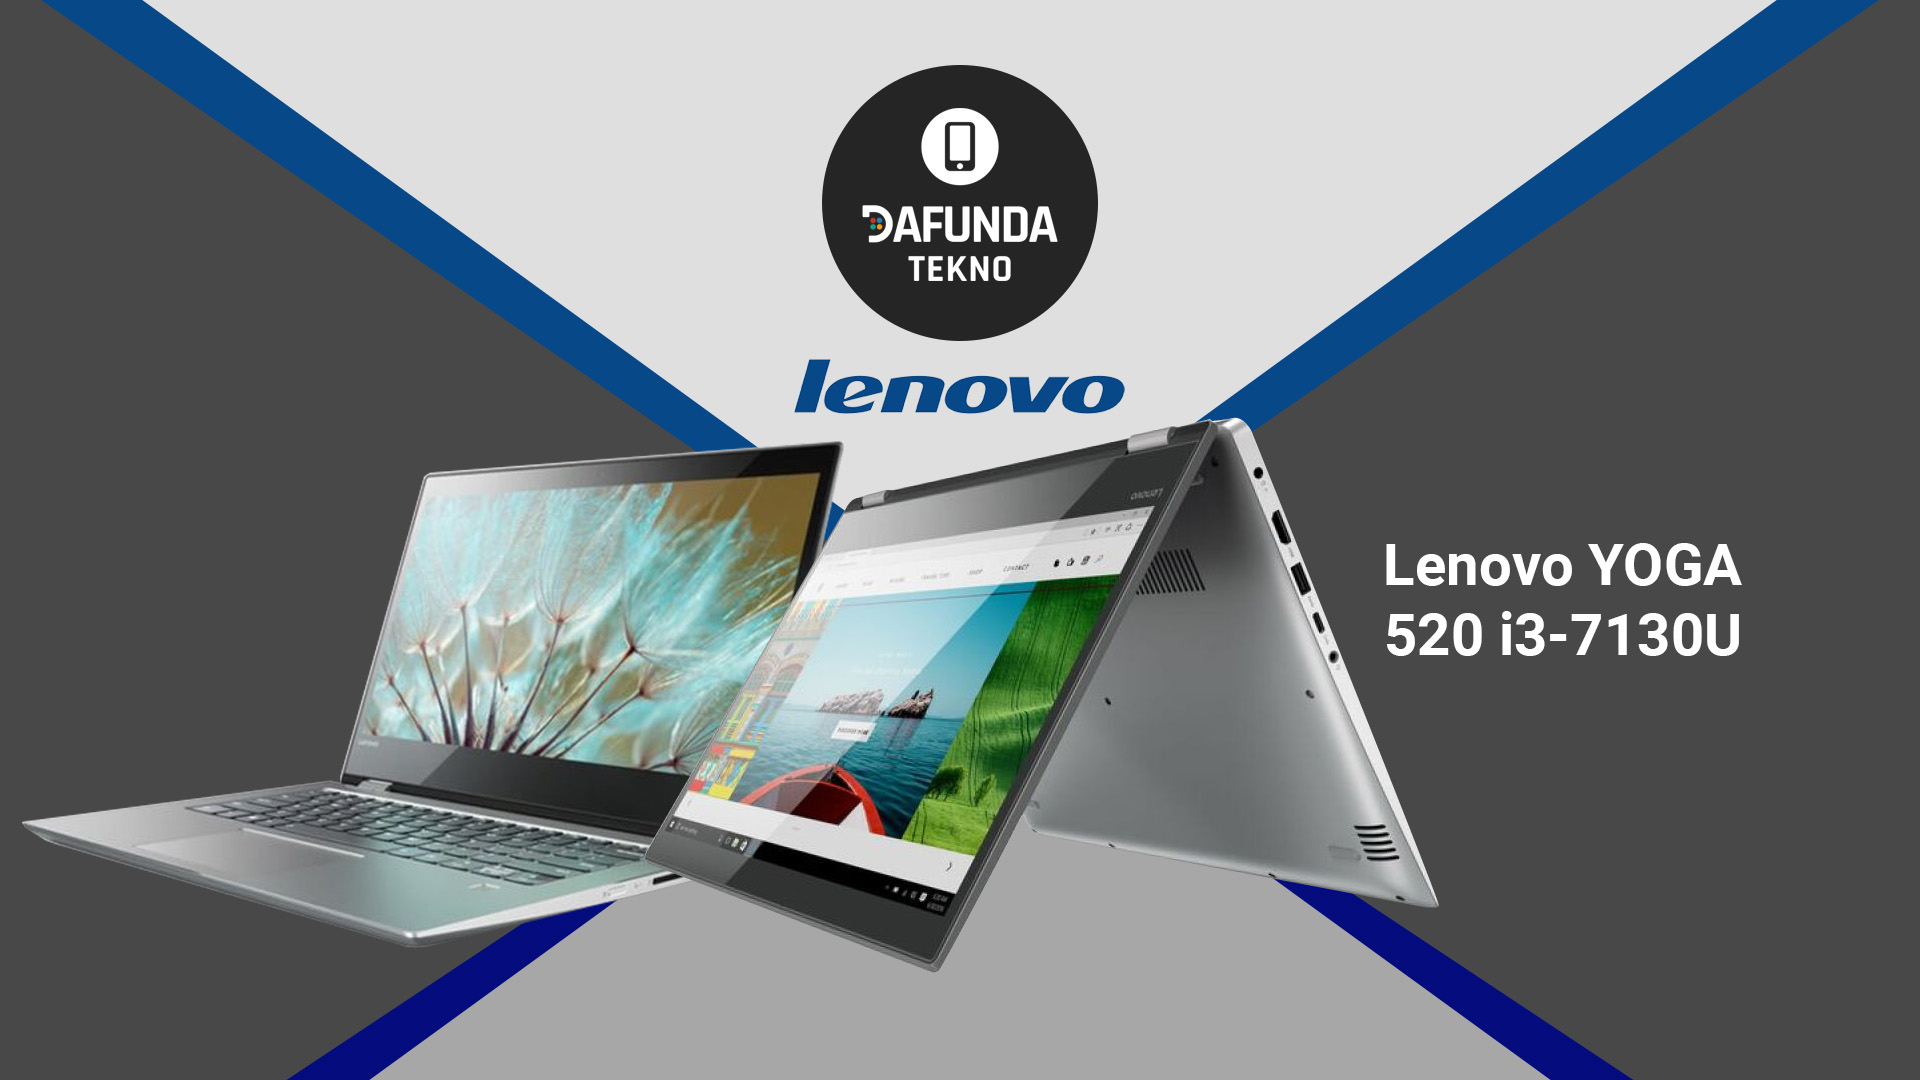 Lenovo Yoga 520 I3 7130u